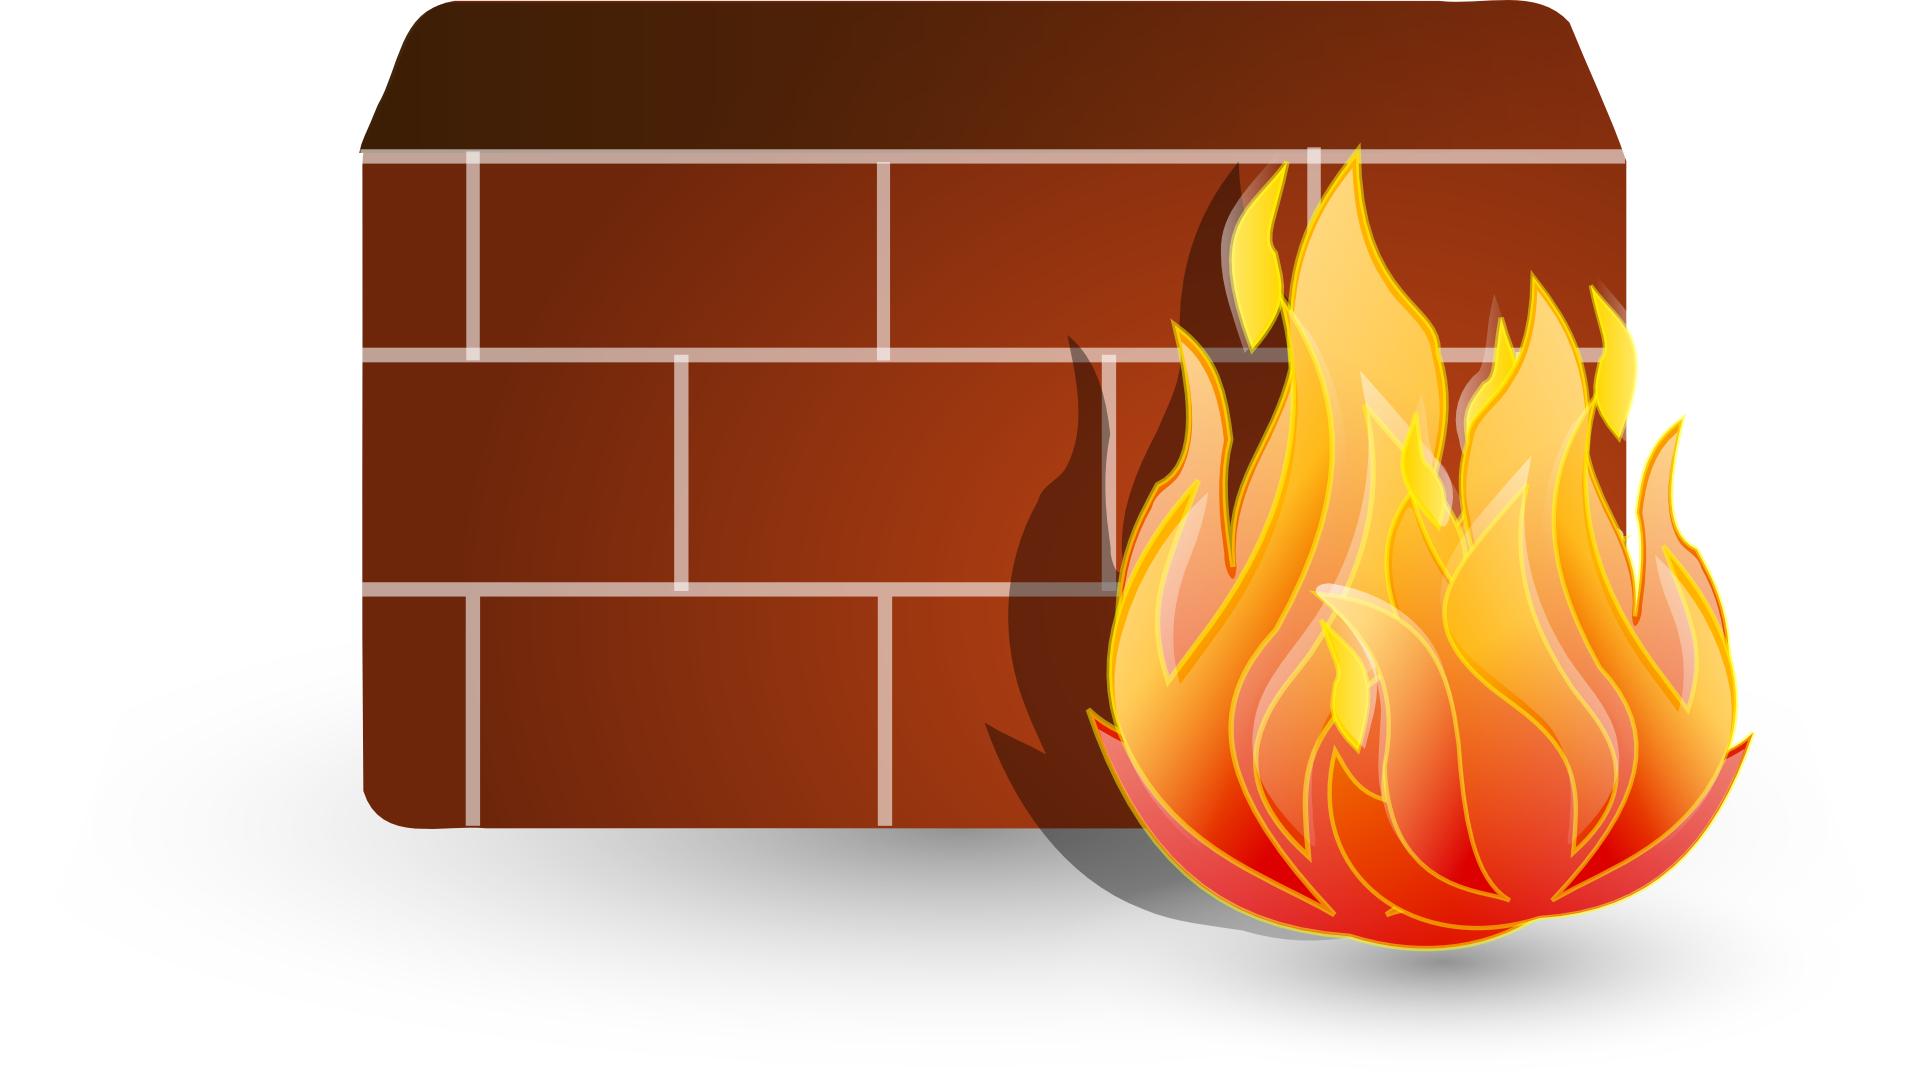 wall,fire,symbol of firewall vector